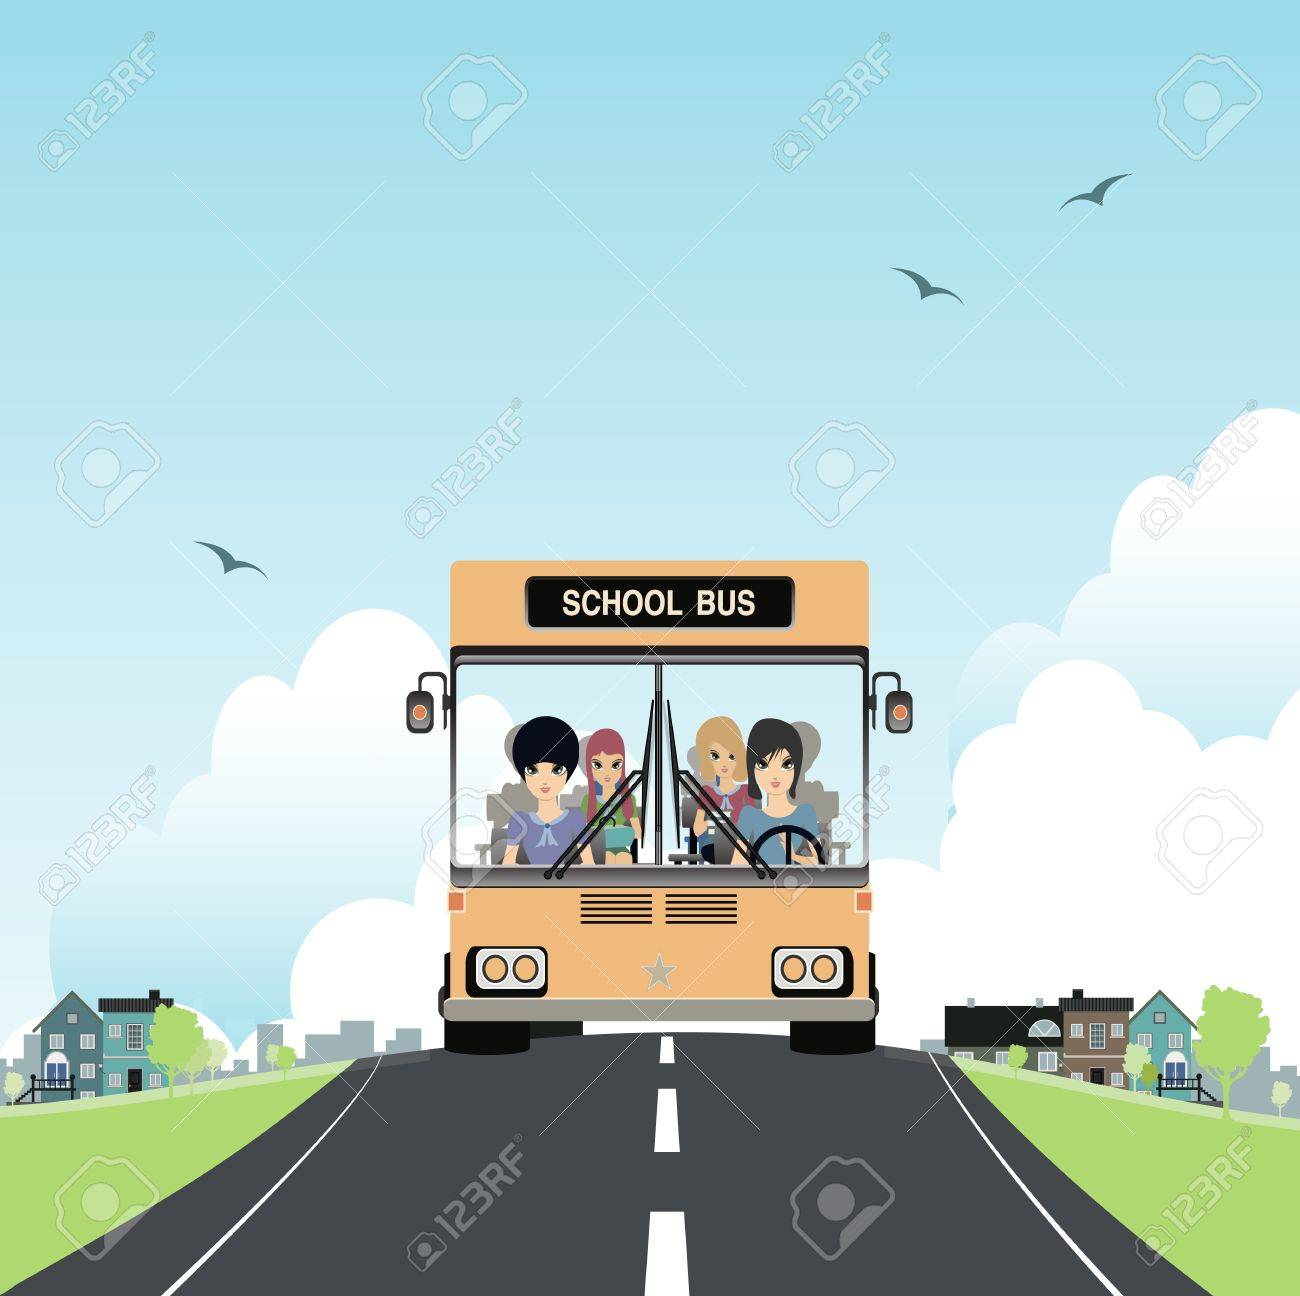 School bus with children in the car Stock Vector - 21990025